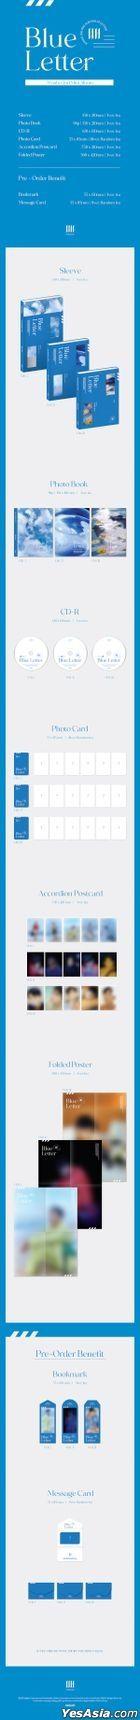 Won Ho Mini Album Vol. 2 - Blue Letter (Random Version)